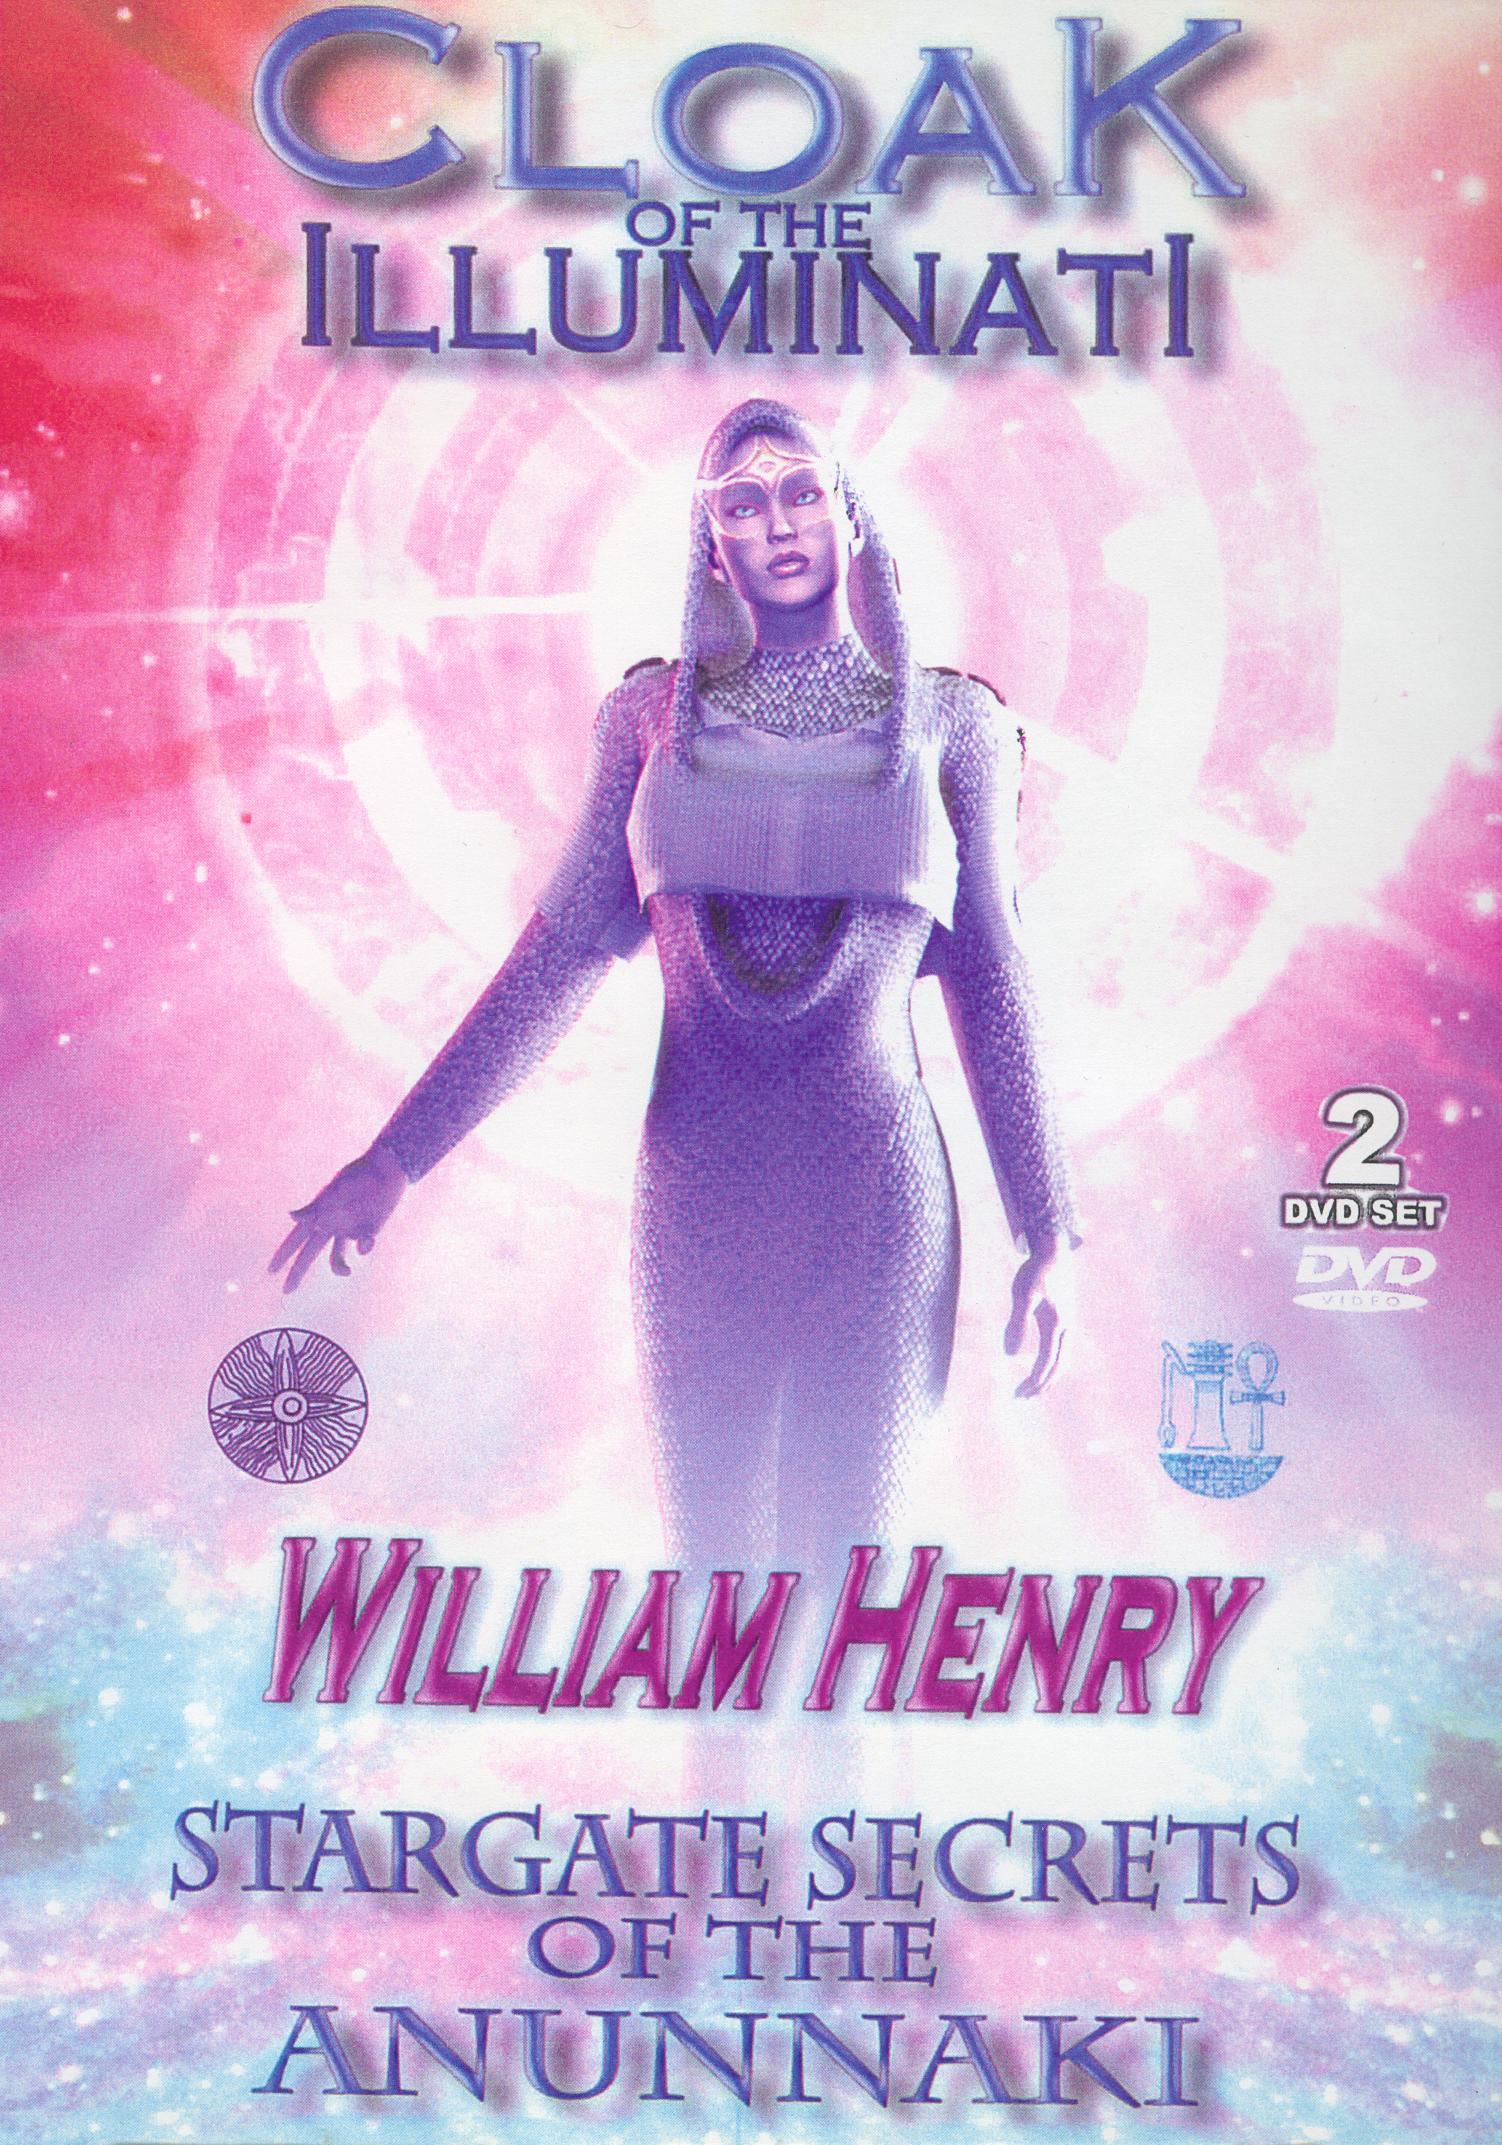 Cloak of the Illuminati: William Henry - Stargate Secrets of the Anunnaki